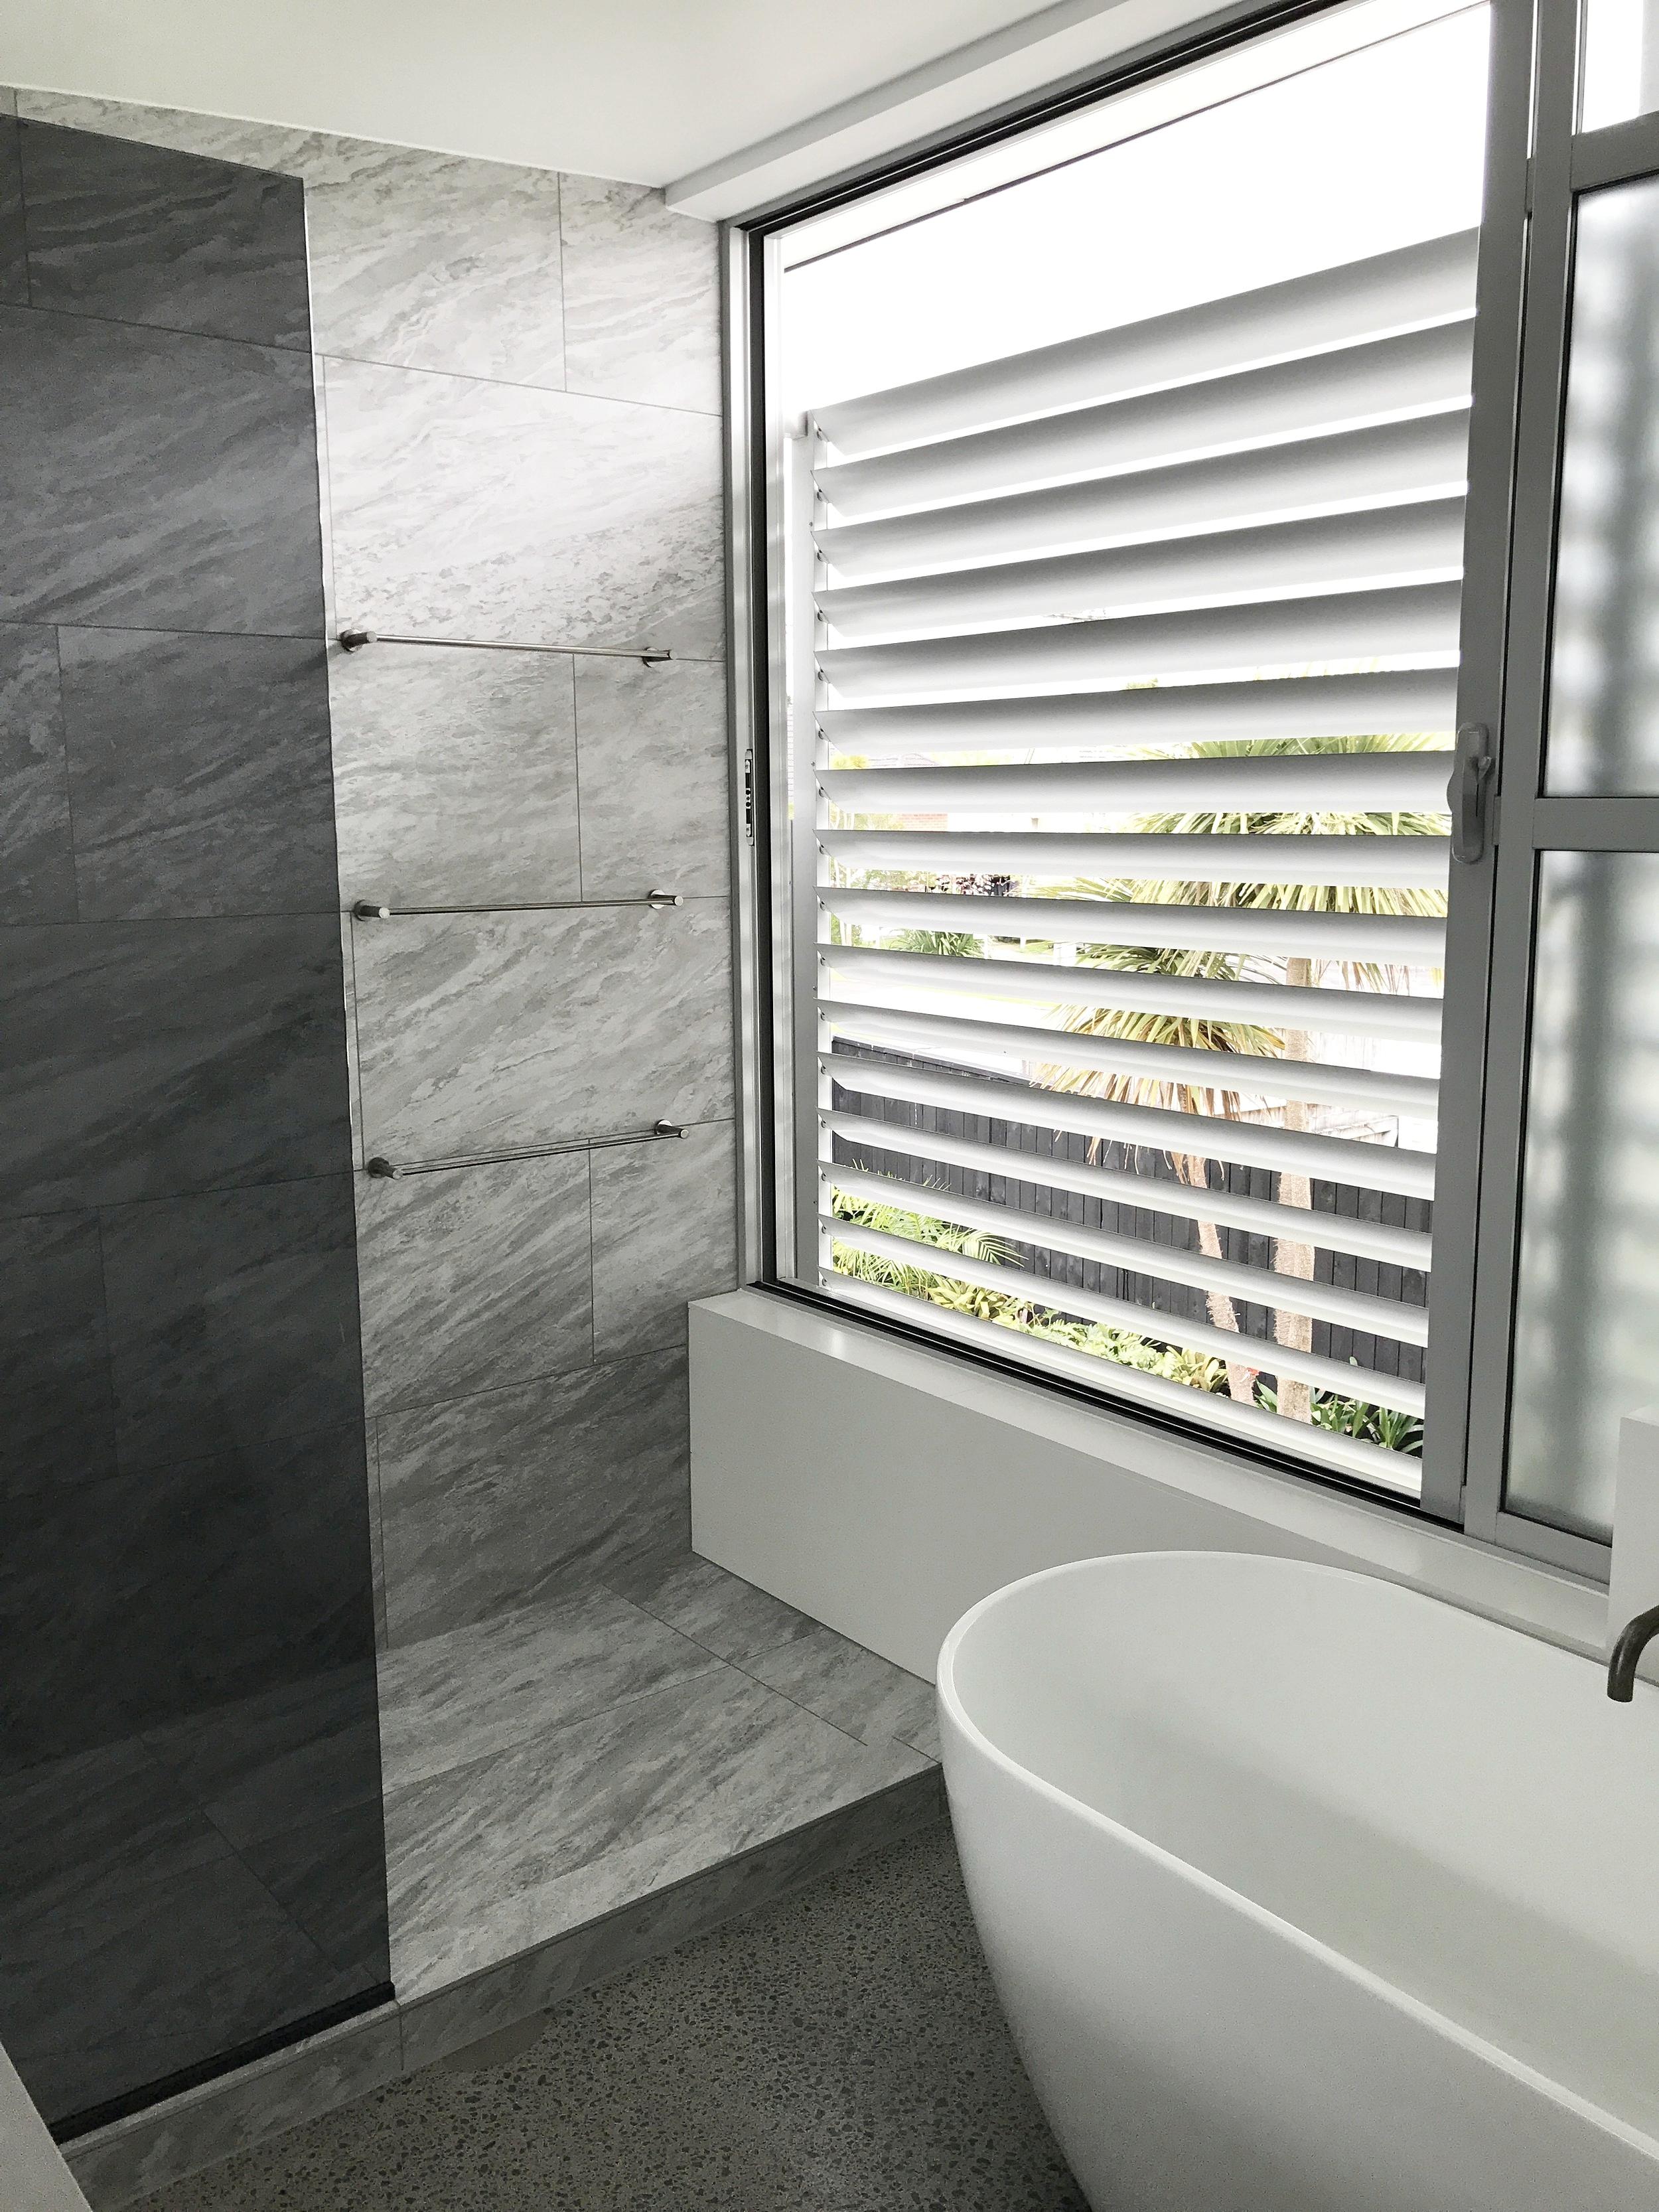 Bathroom with a monochrome design